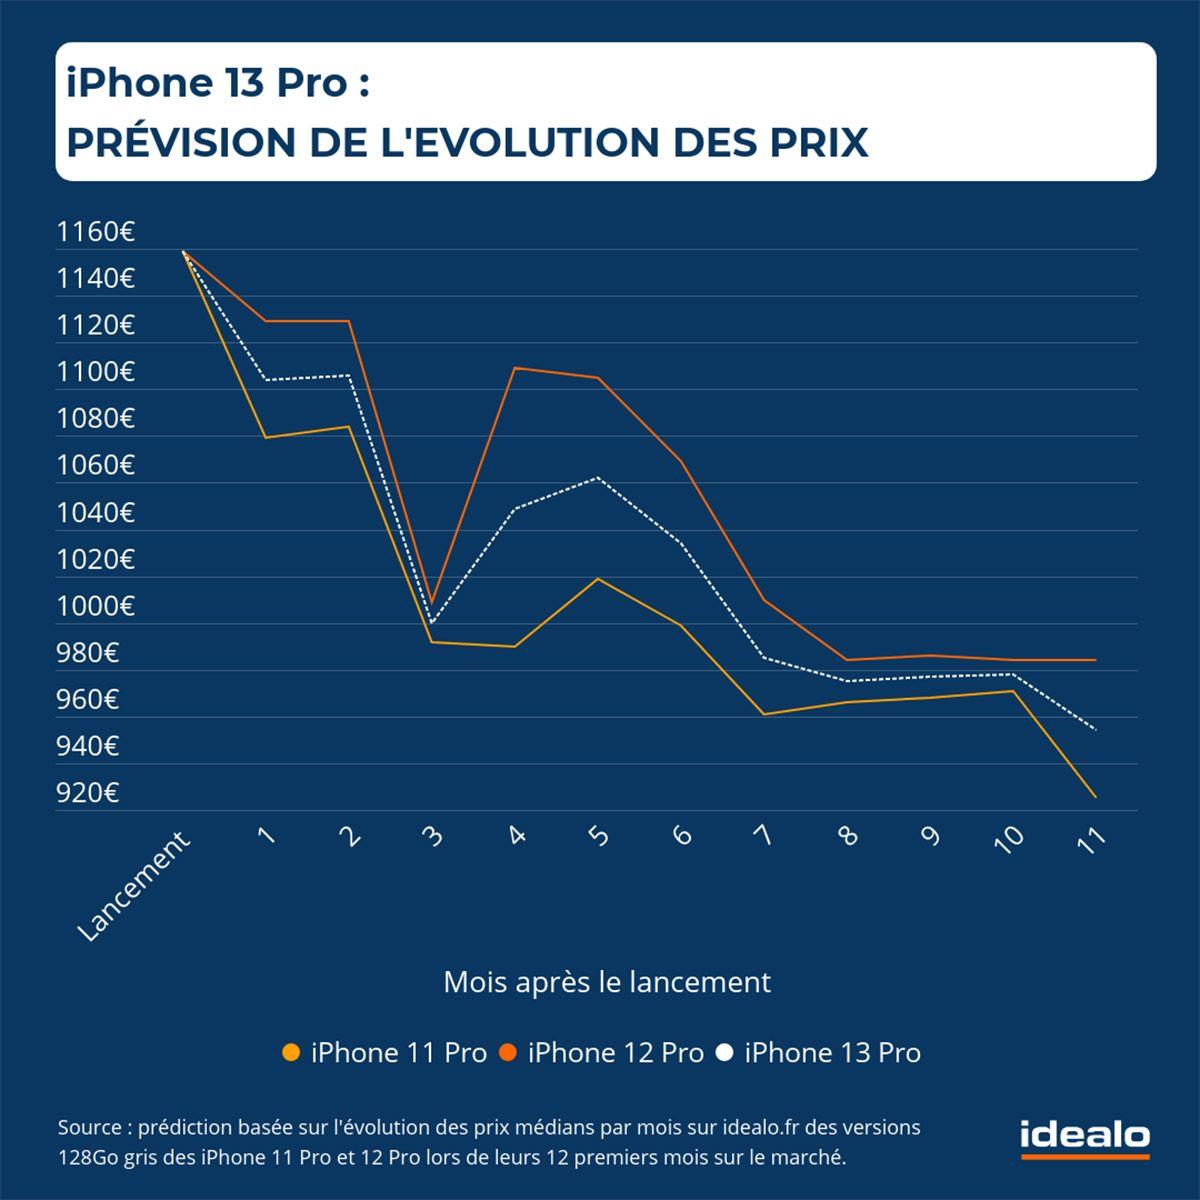 idealo iphone 13 pro